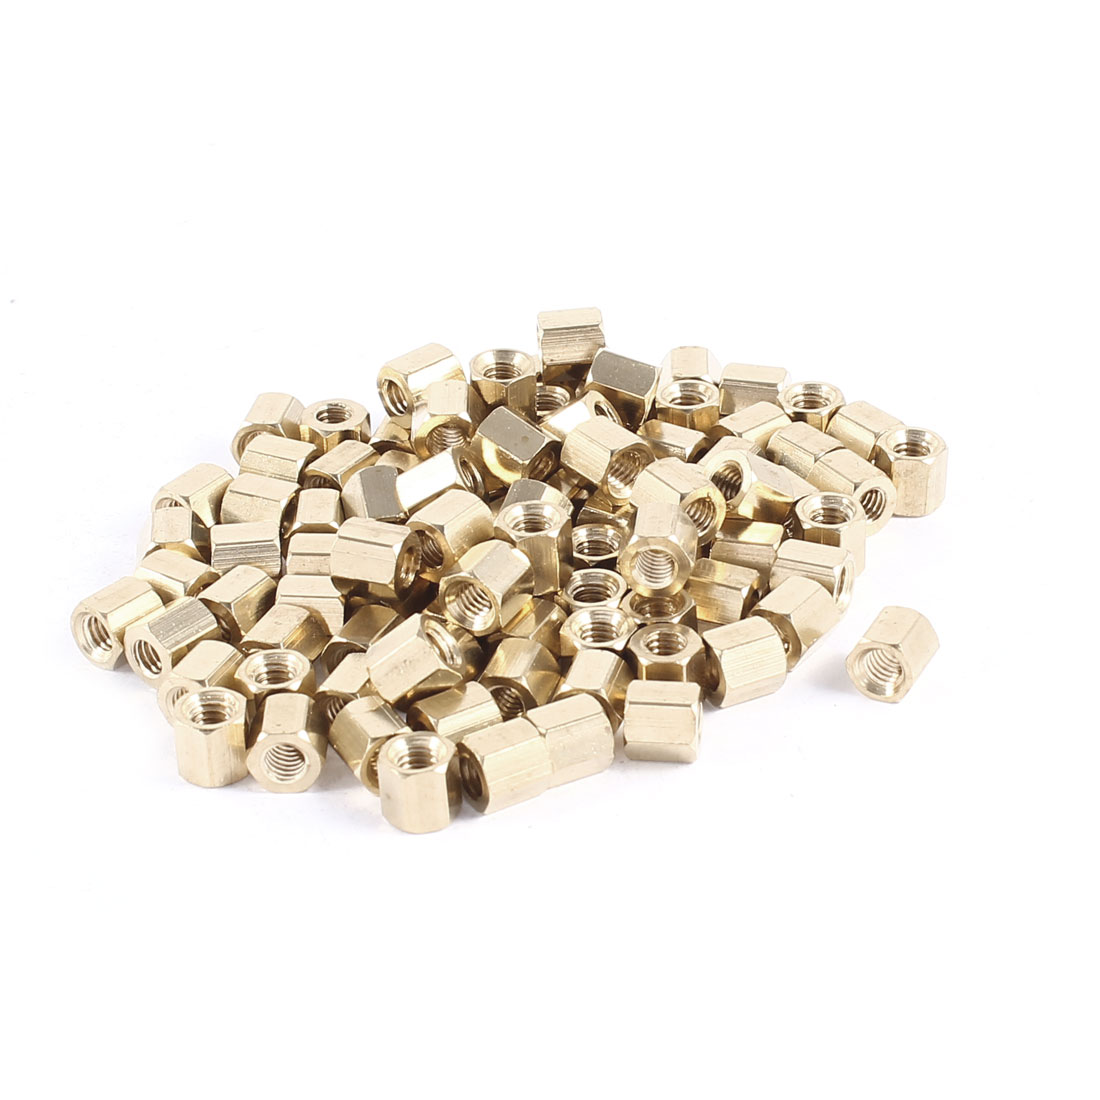 100 Pcs Hex Female Nut Brass Standoff Spacer M4x6 M4 6mm